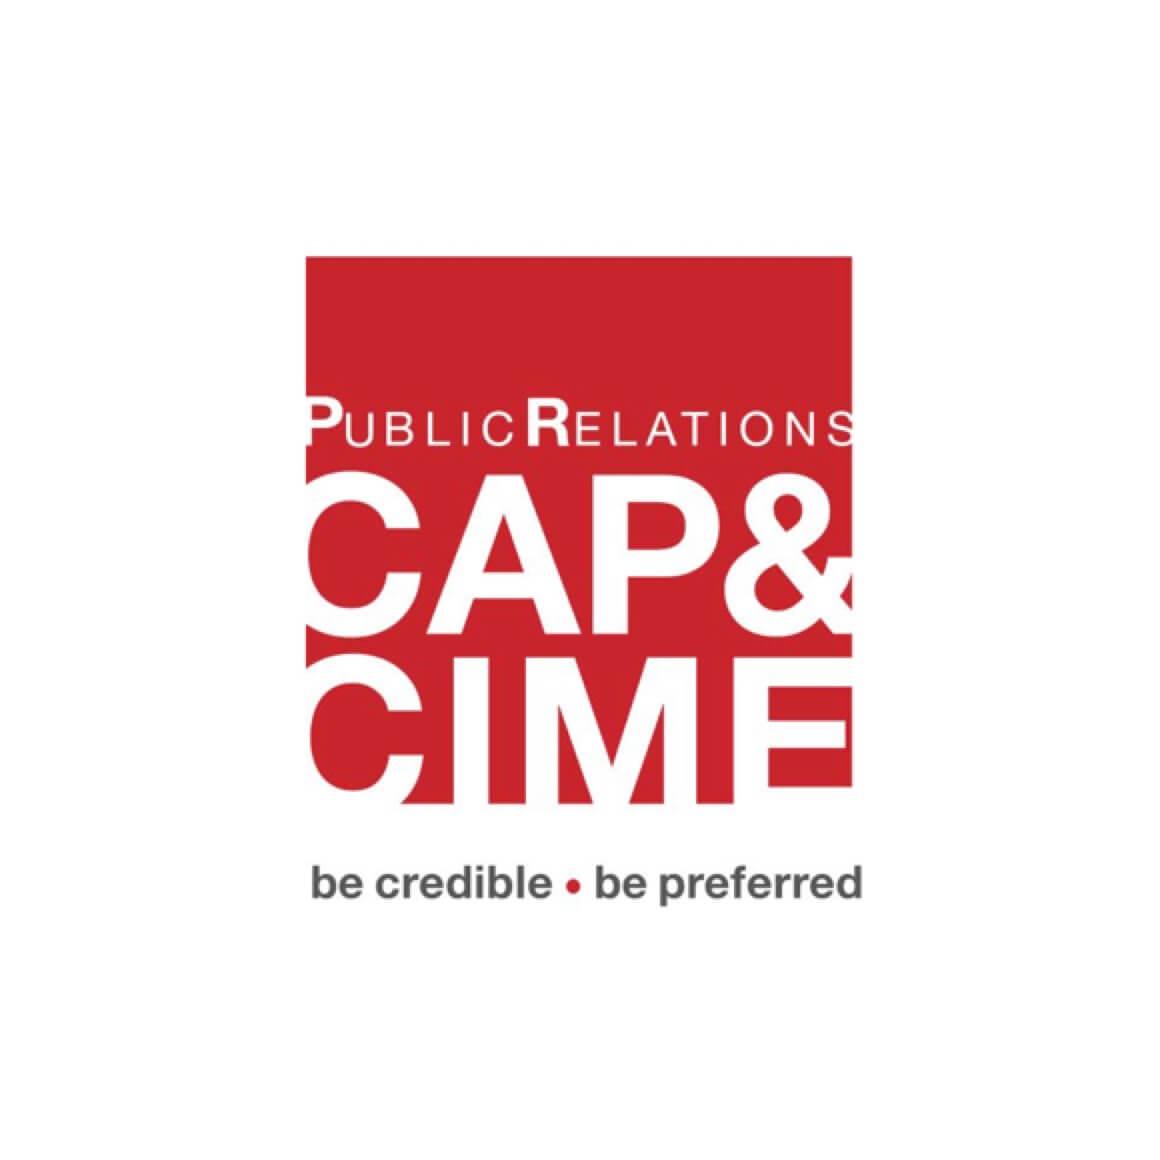 cape_cime